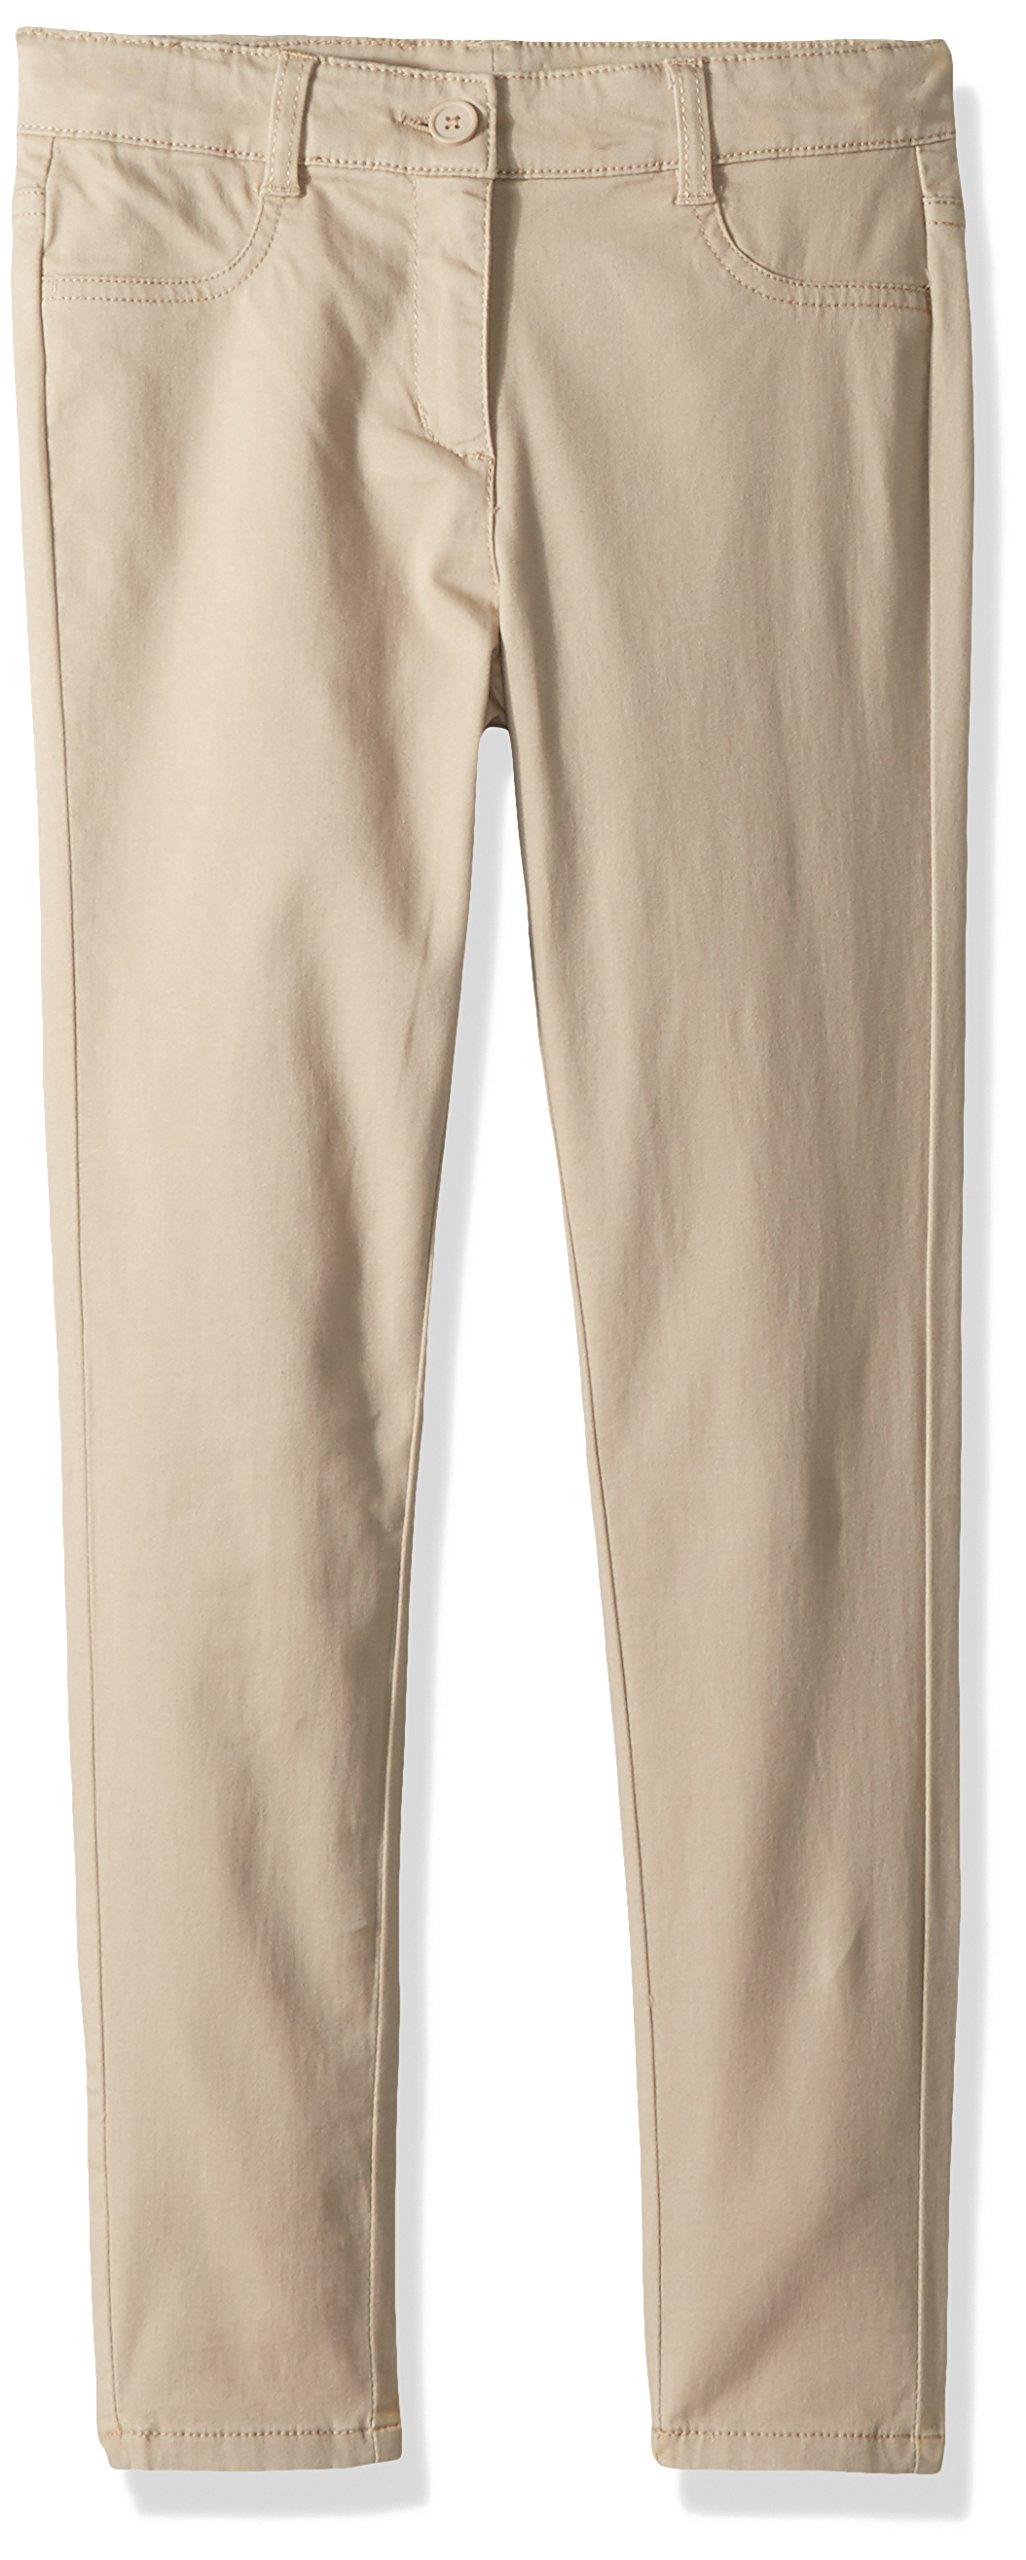 Nautica Big Girls' Twill Pant, Khaki/Five Pocket, 16